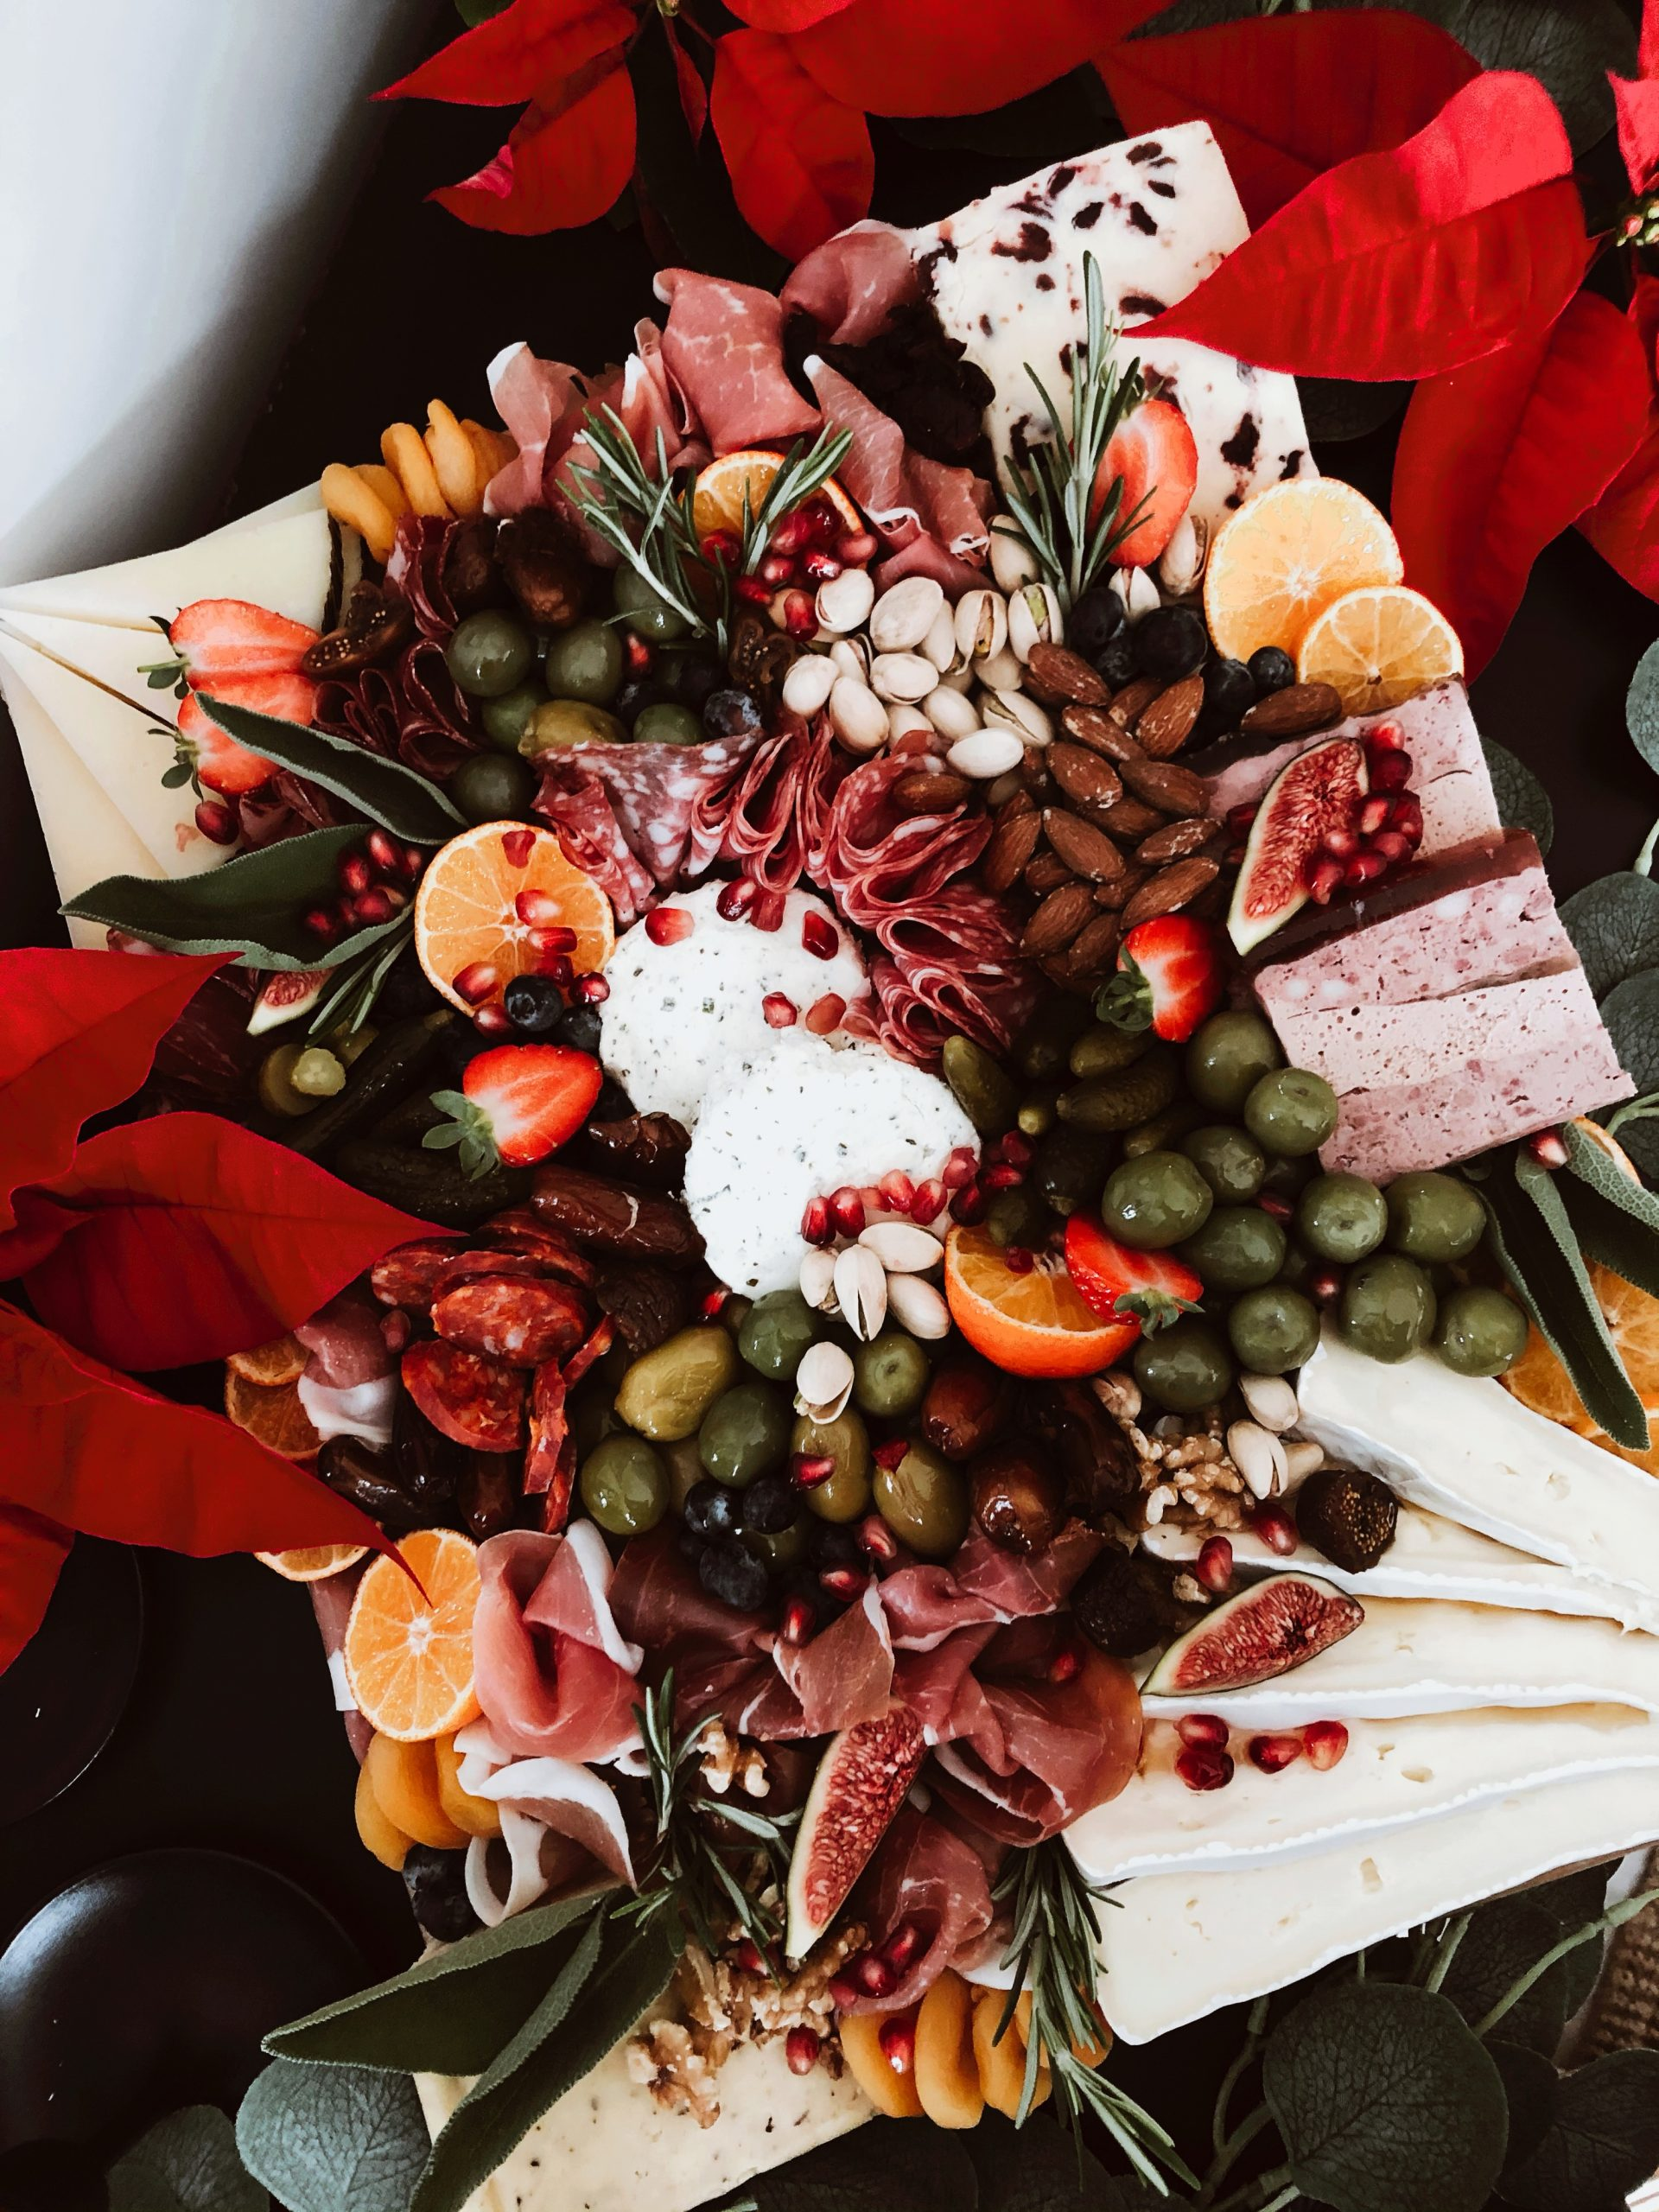 The Festive Feast Platter